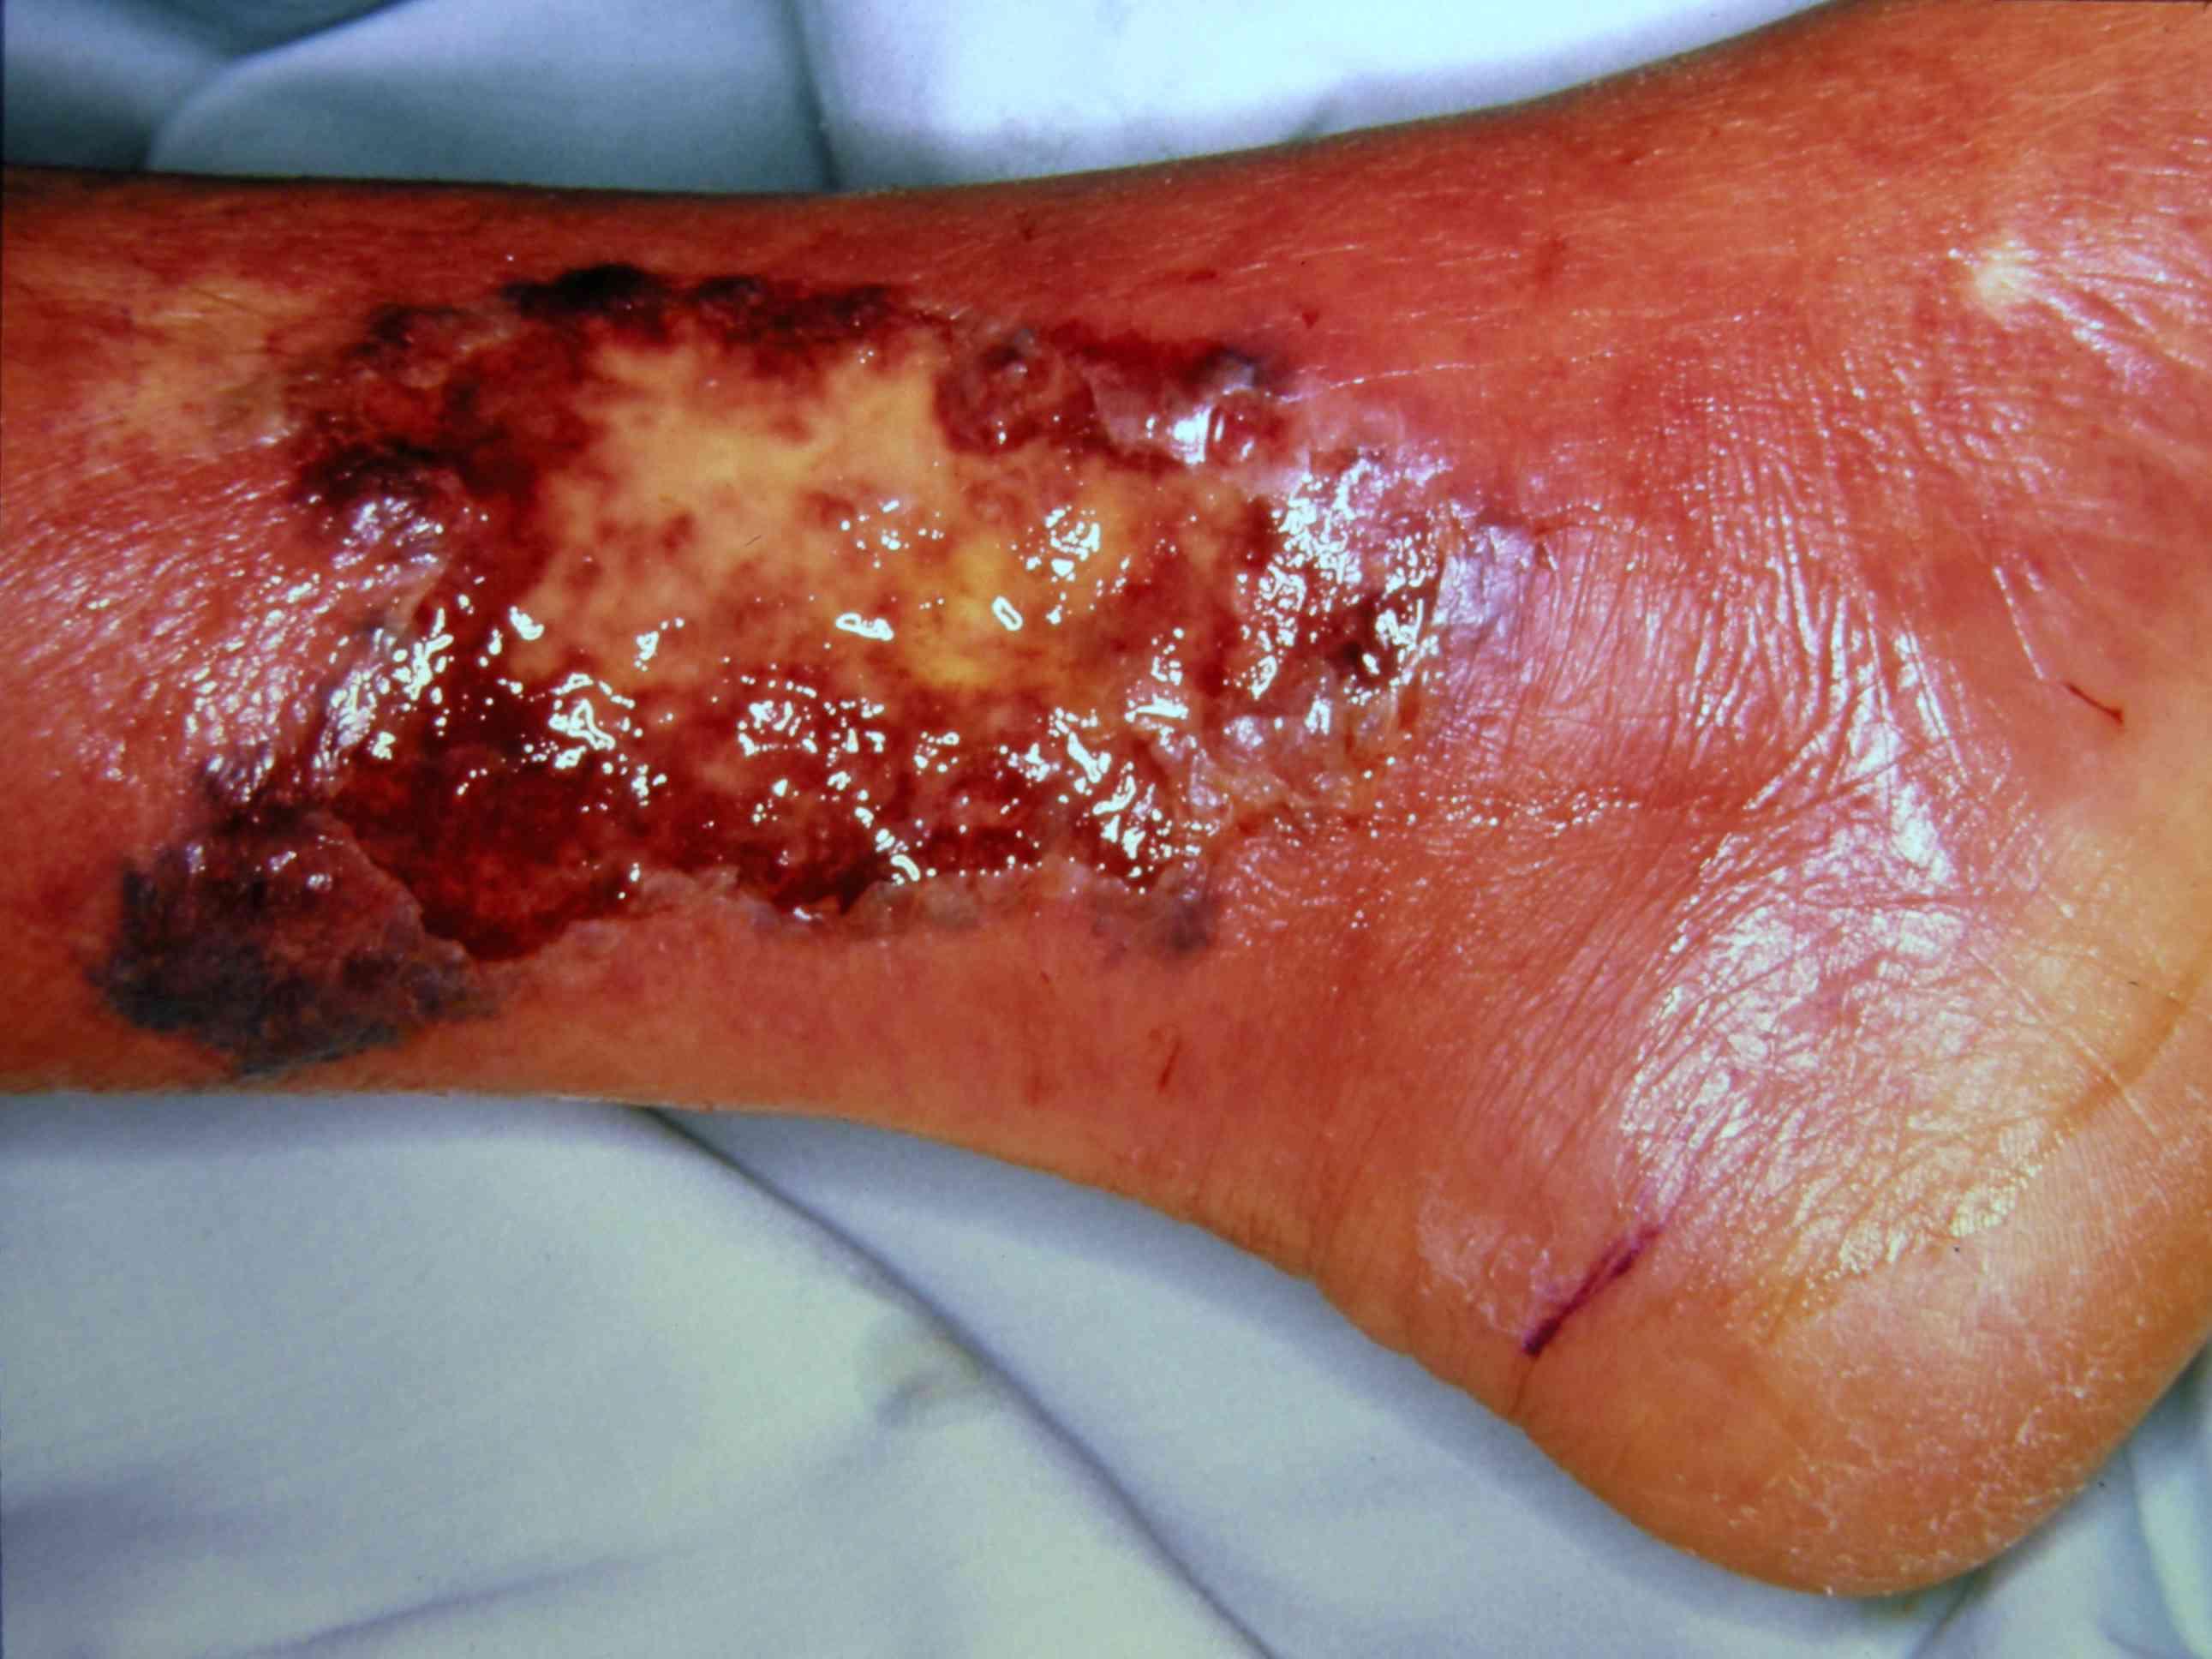 Pyoderma gangrenosum on ankle